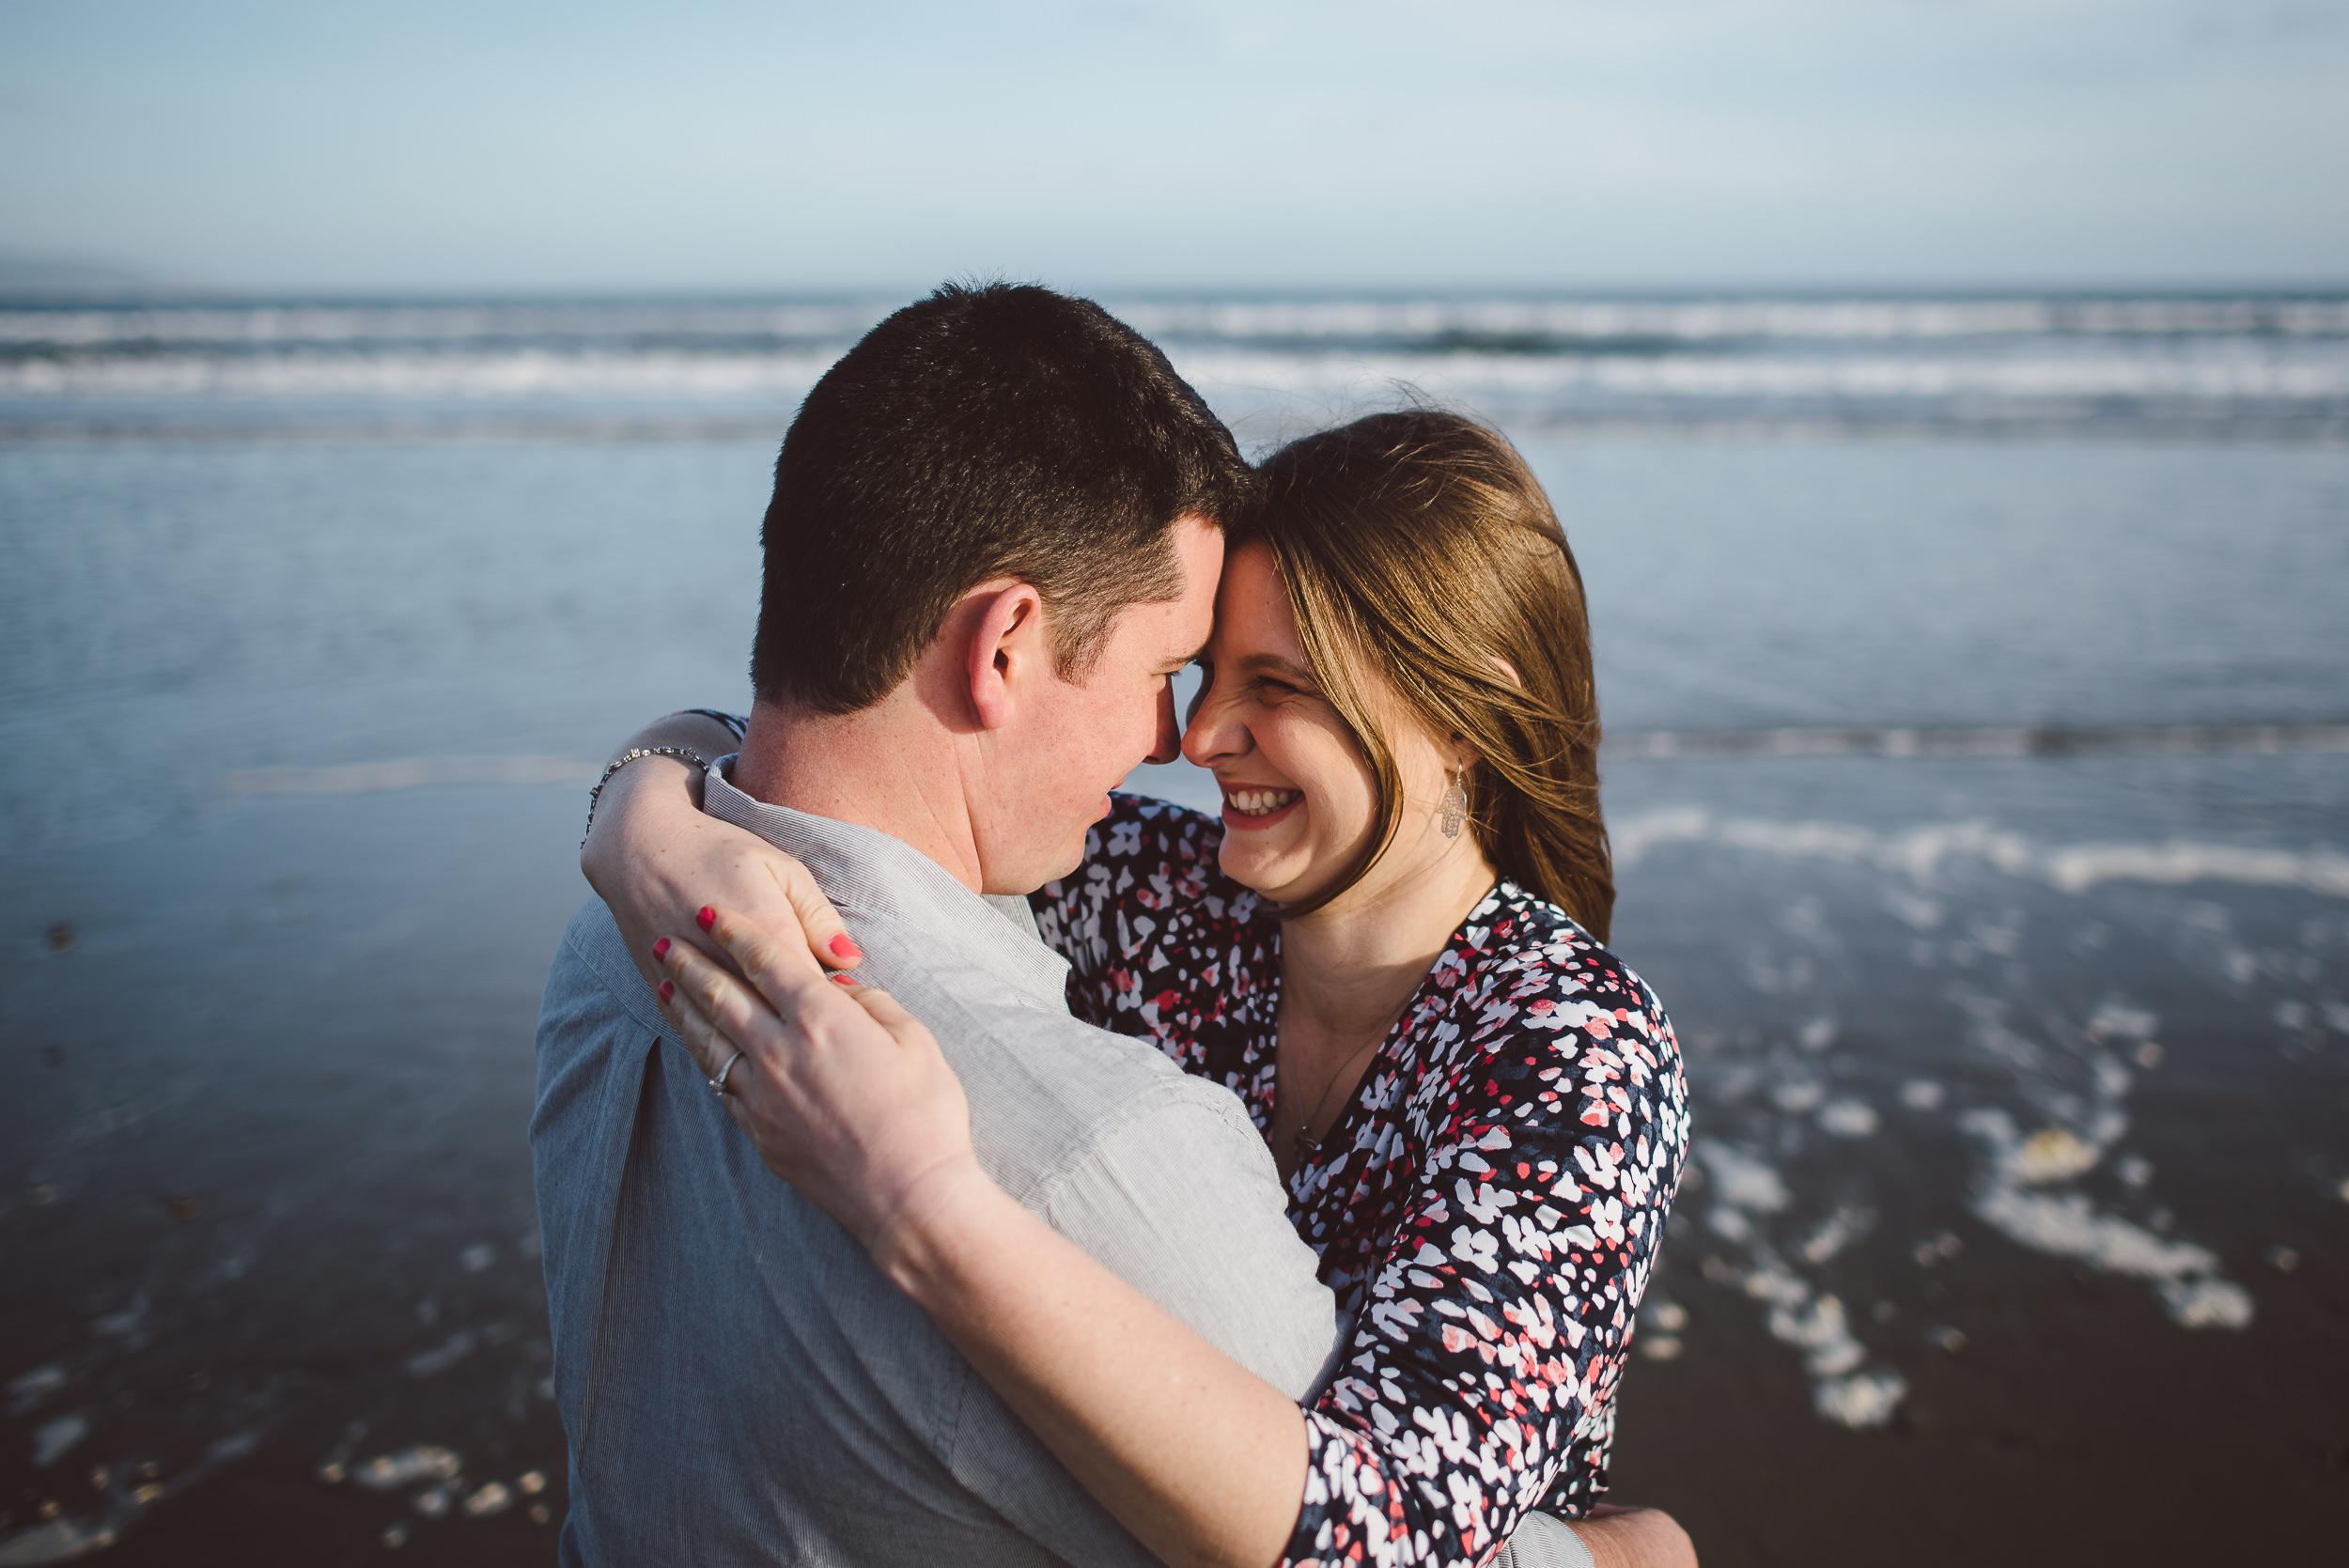 Point-Reyes-Engagement-Photography-007.jpg